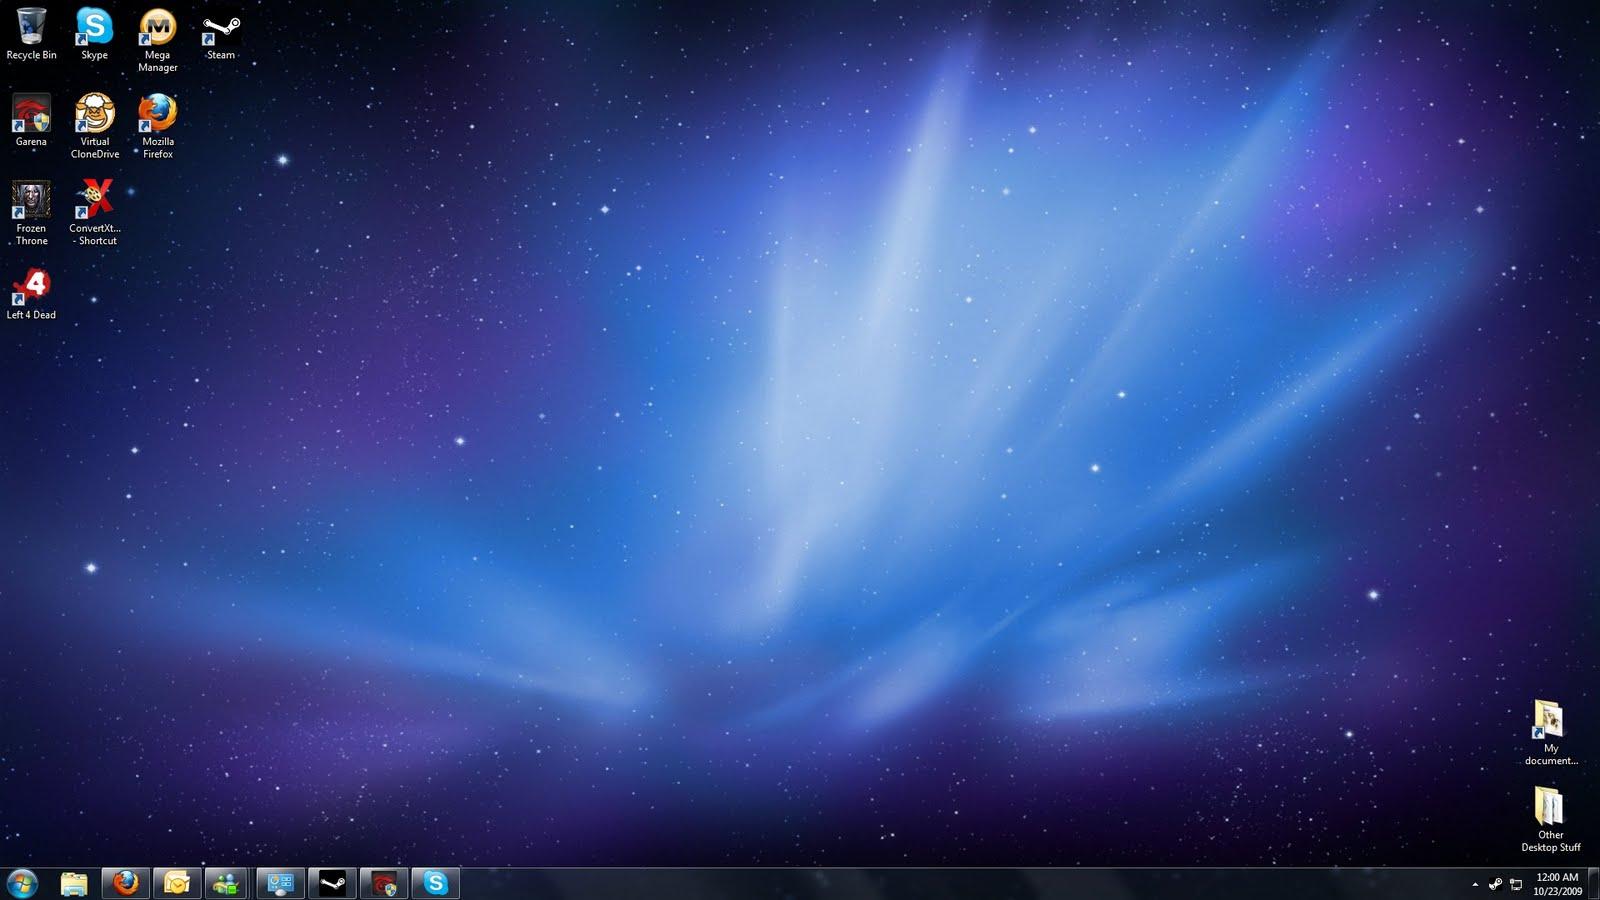 http://2.bp.blogspot.com/_YBcN-lSaJ3E/SuCC0gdRuQI/AAAAAAAAAPg/PcKR3-HImnc/s1600/Windows7personal.jpg